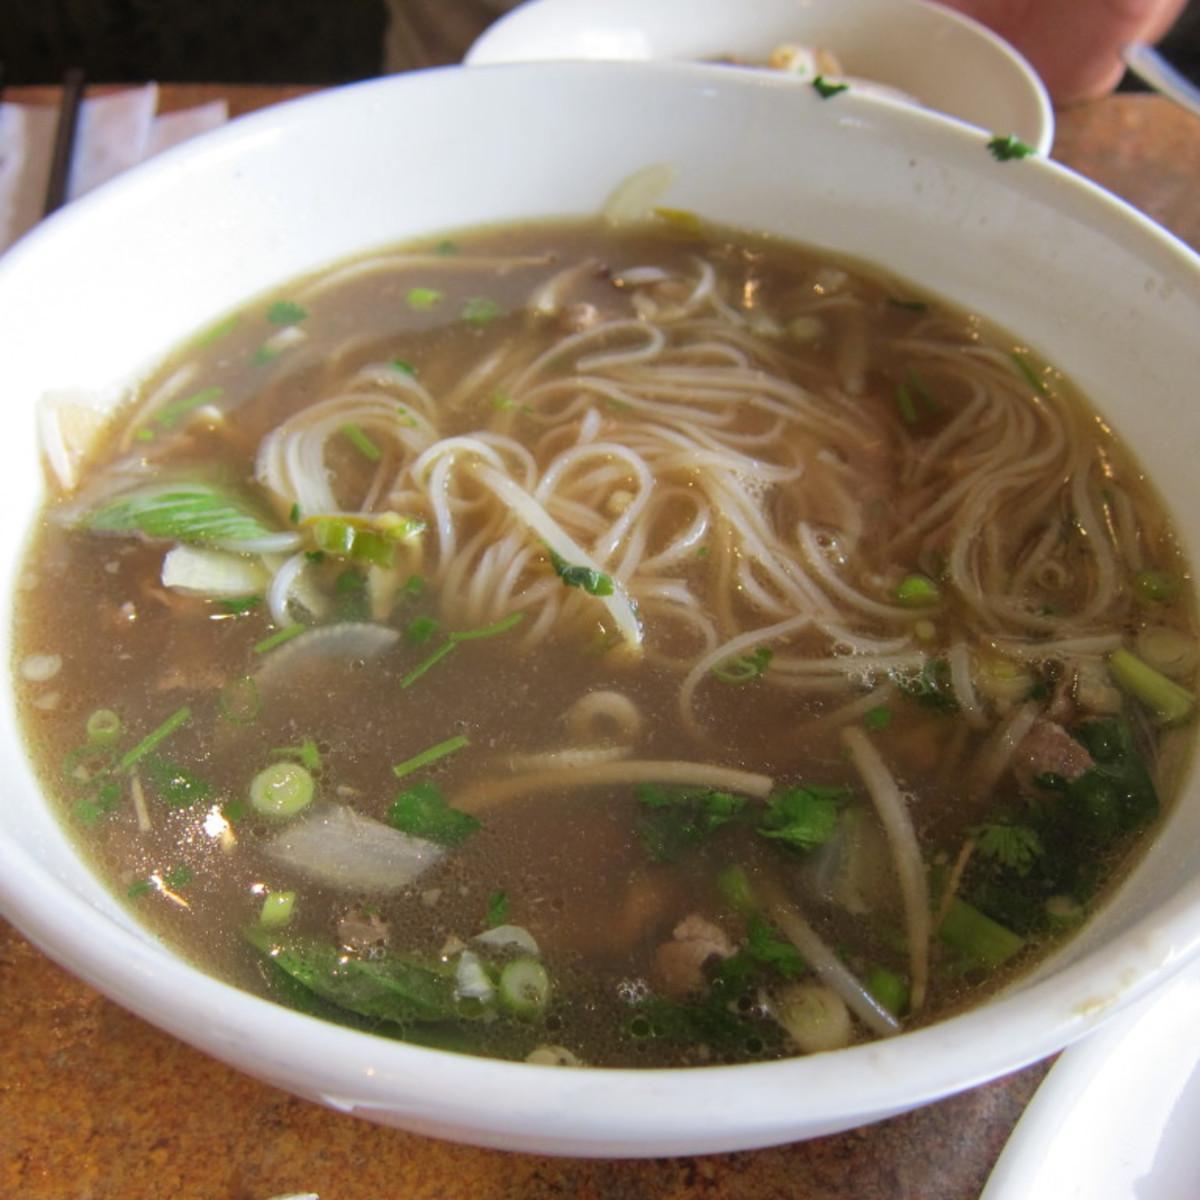 Austin photo: Food_888_PanAsian_Cuisine_Pho